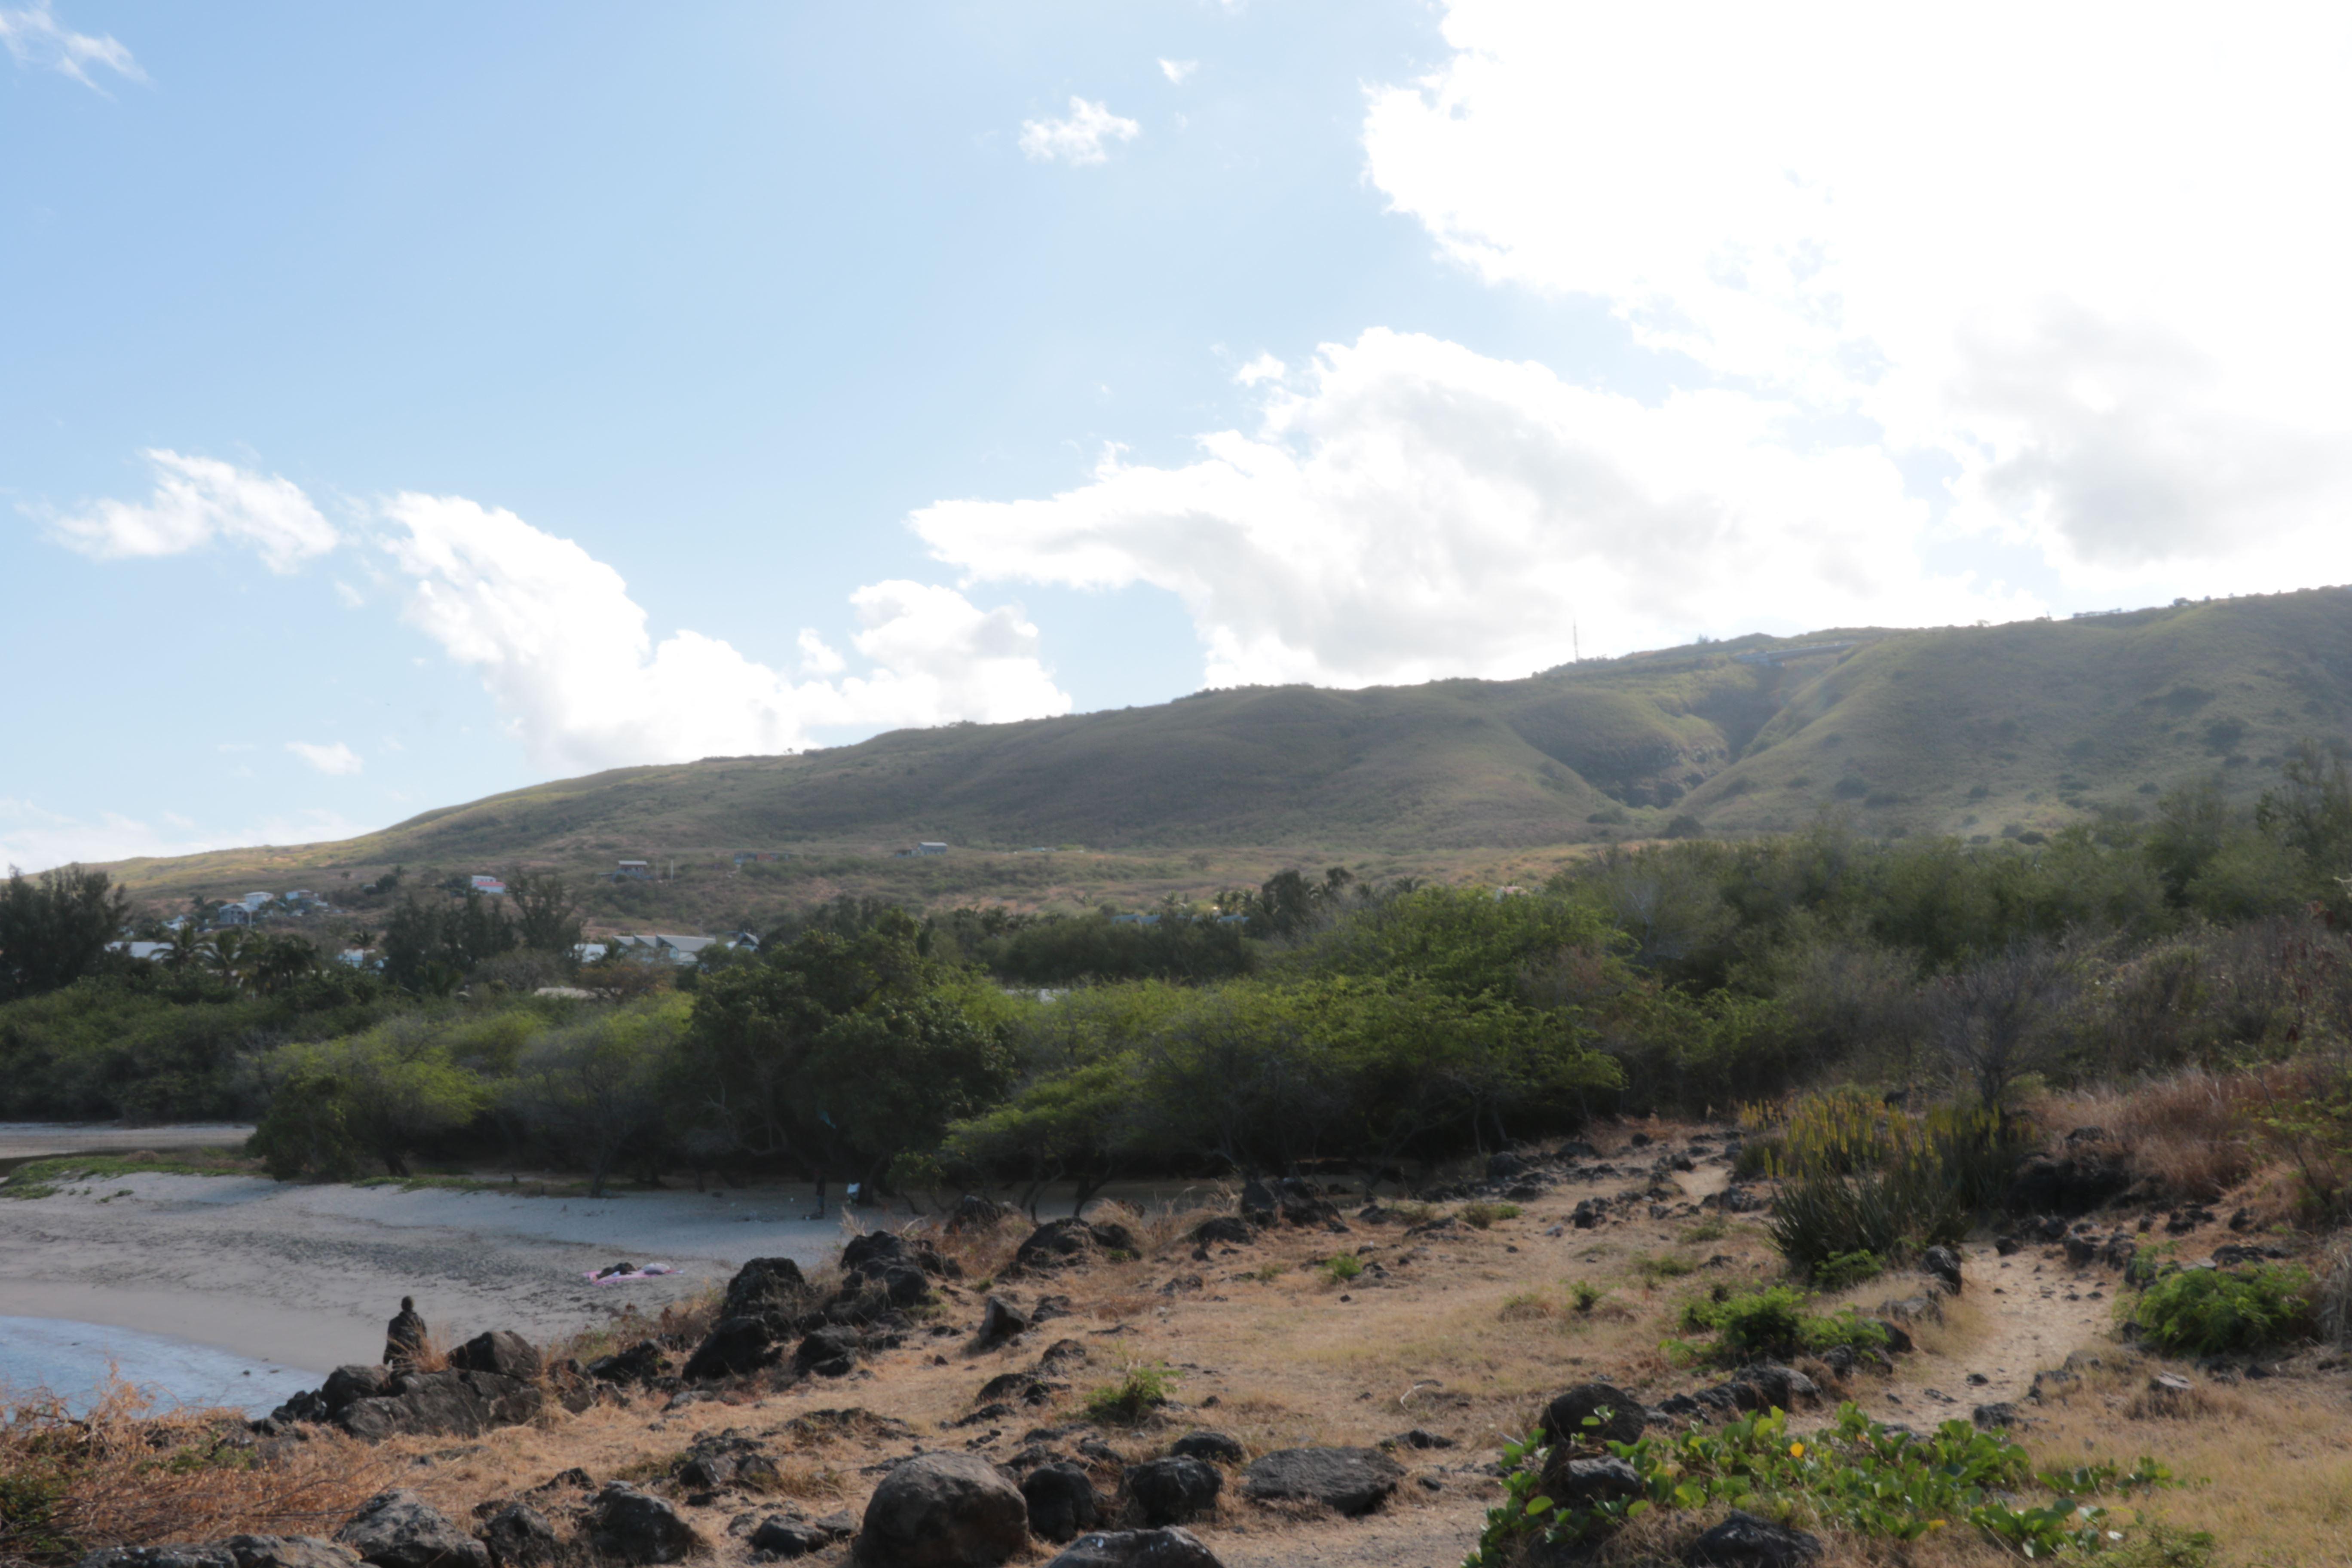 Zarlor balade bord' mer - Dans la ravine interdite